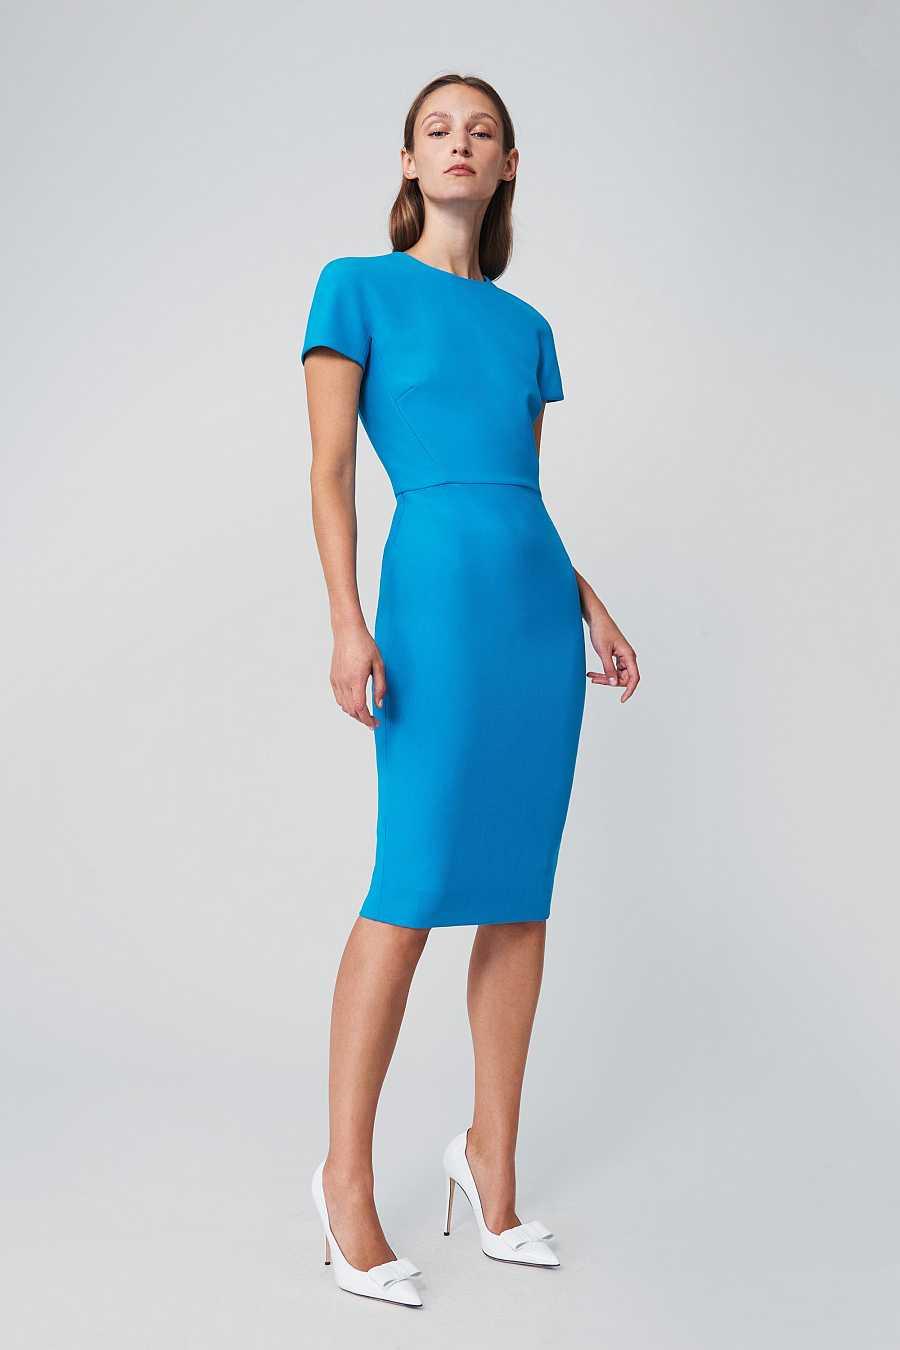 Vestido 'camiseta' azul turquesa diseñado por Victoria Beckham